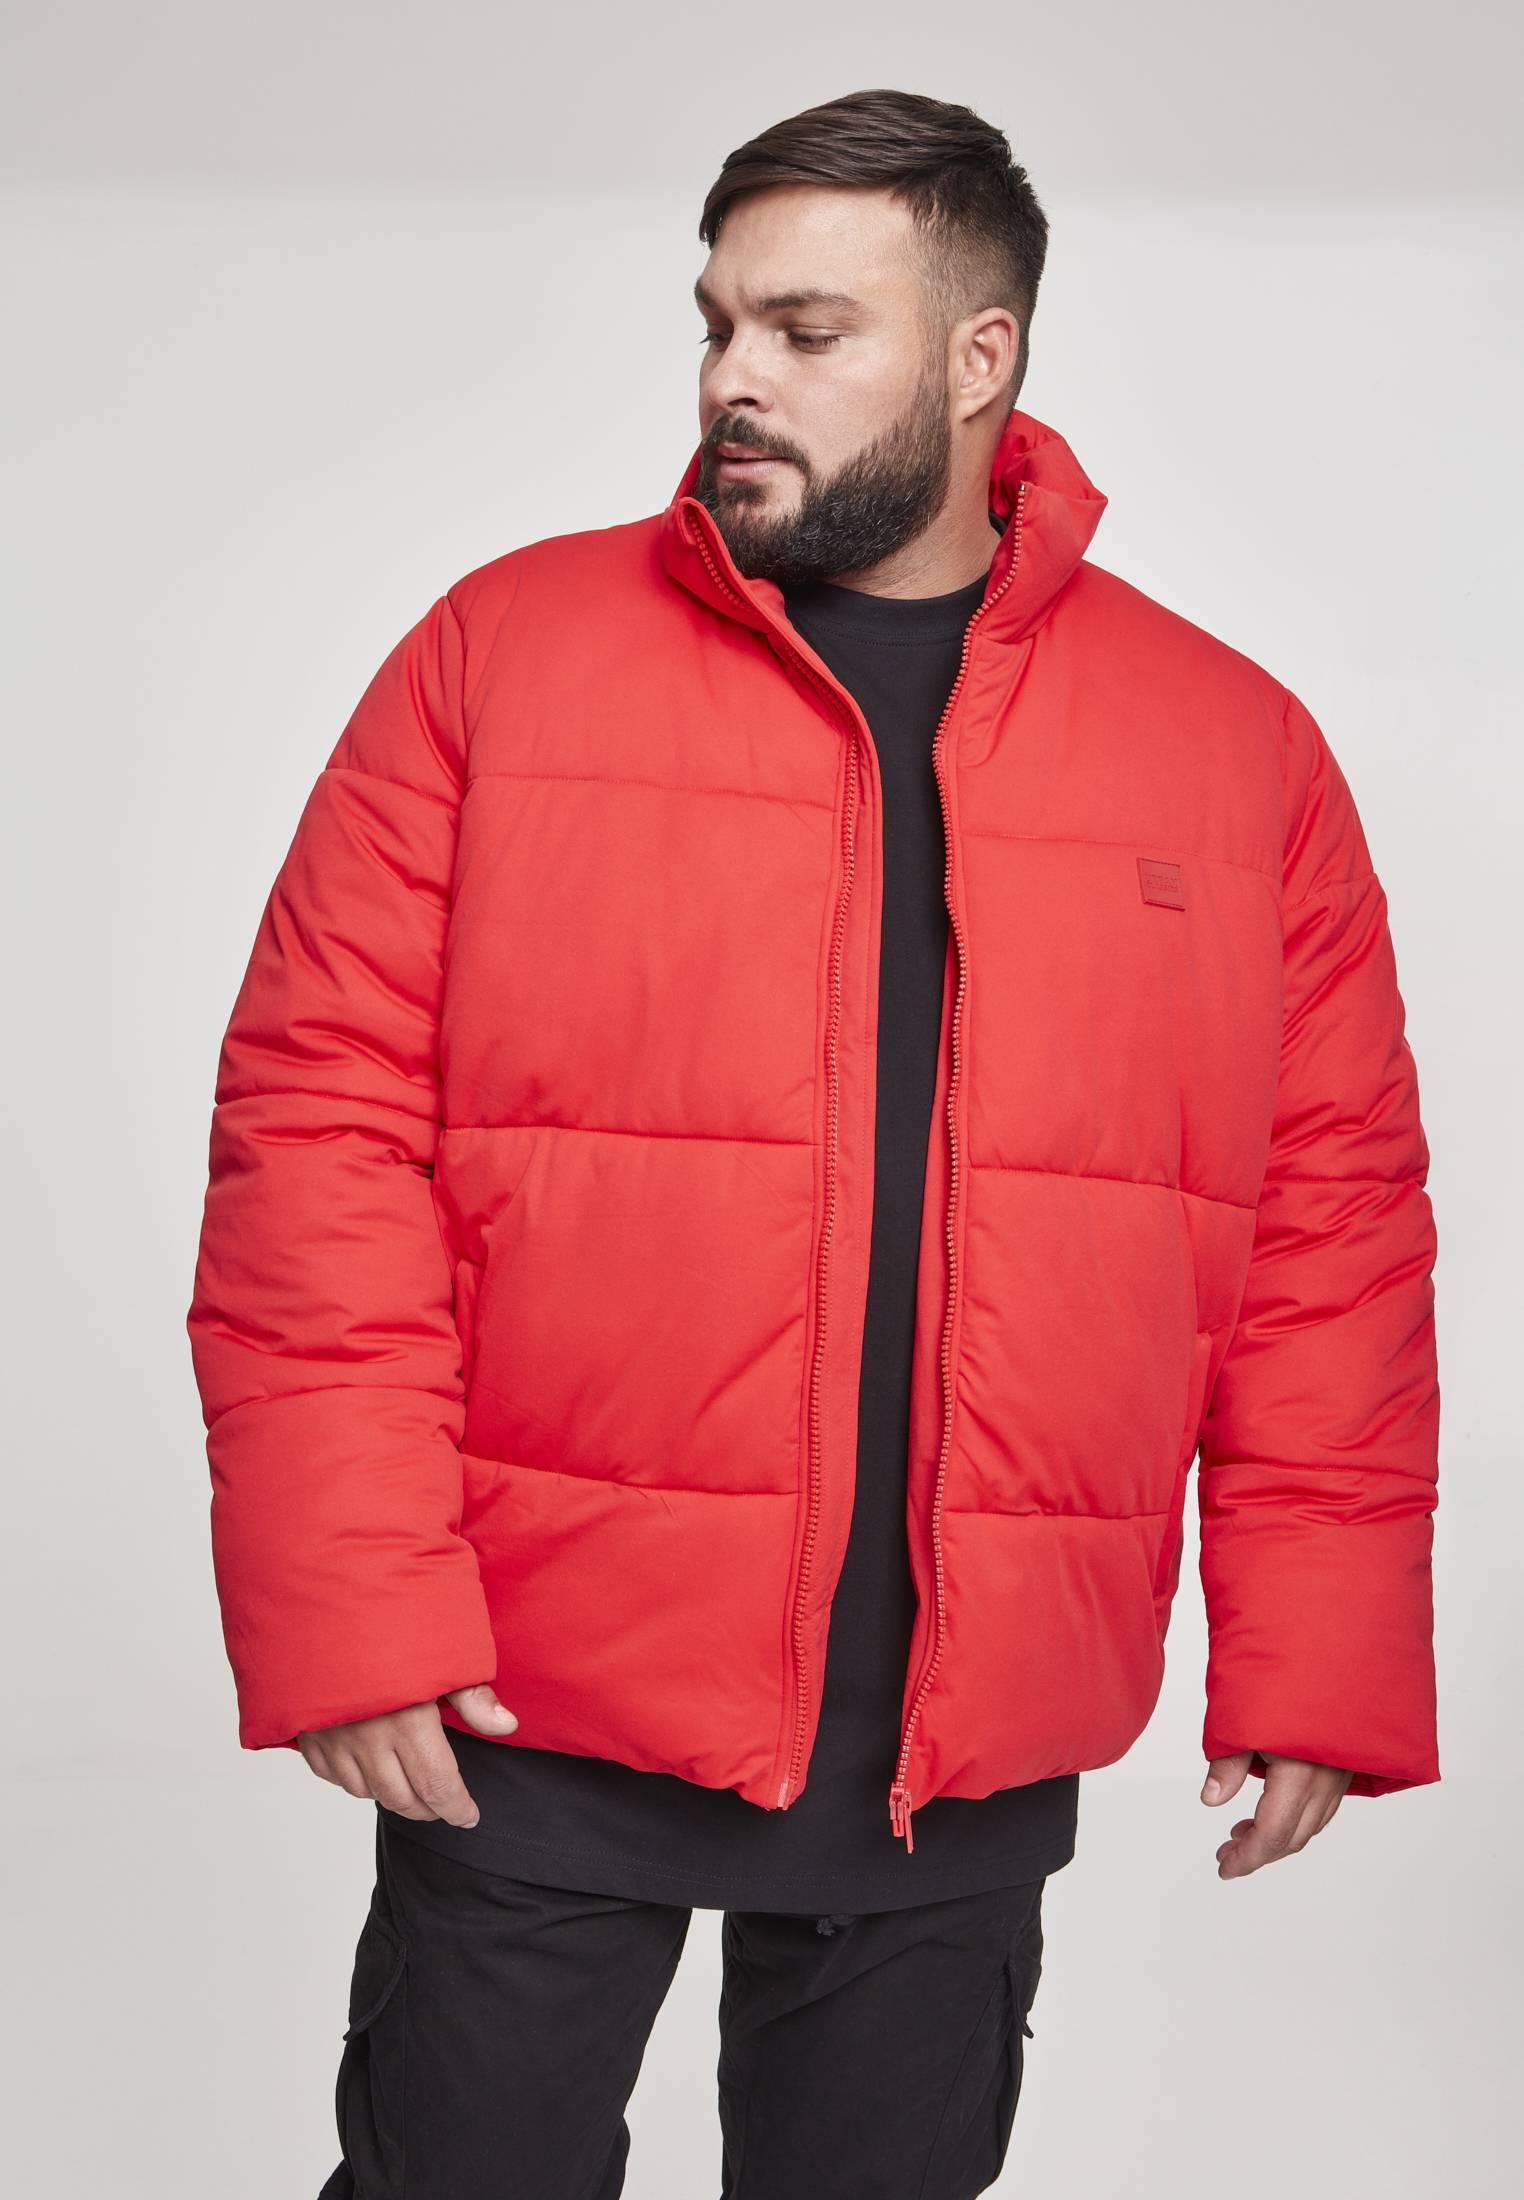 Urban Classics Boxy Puffer Jacket fire red - S